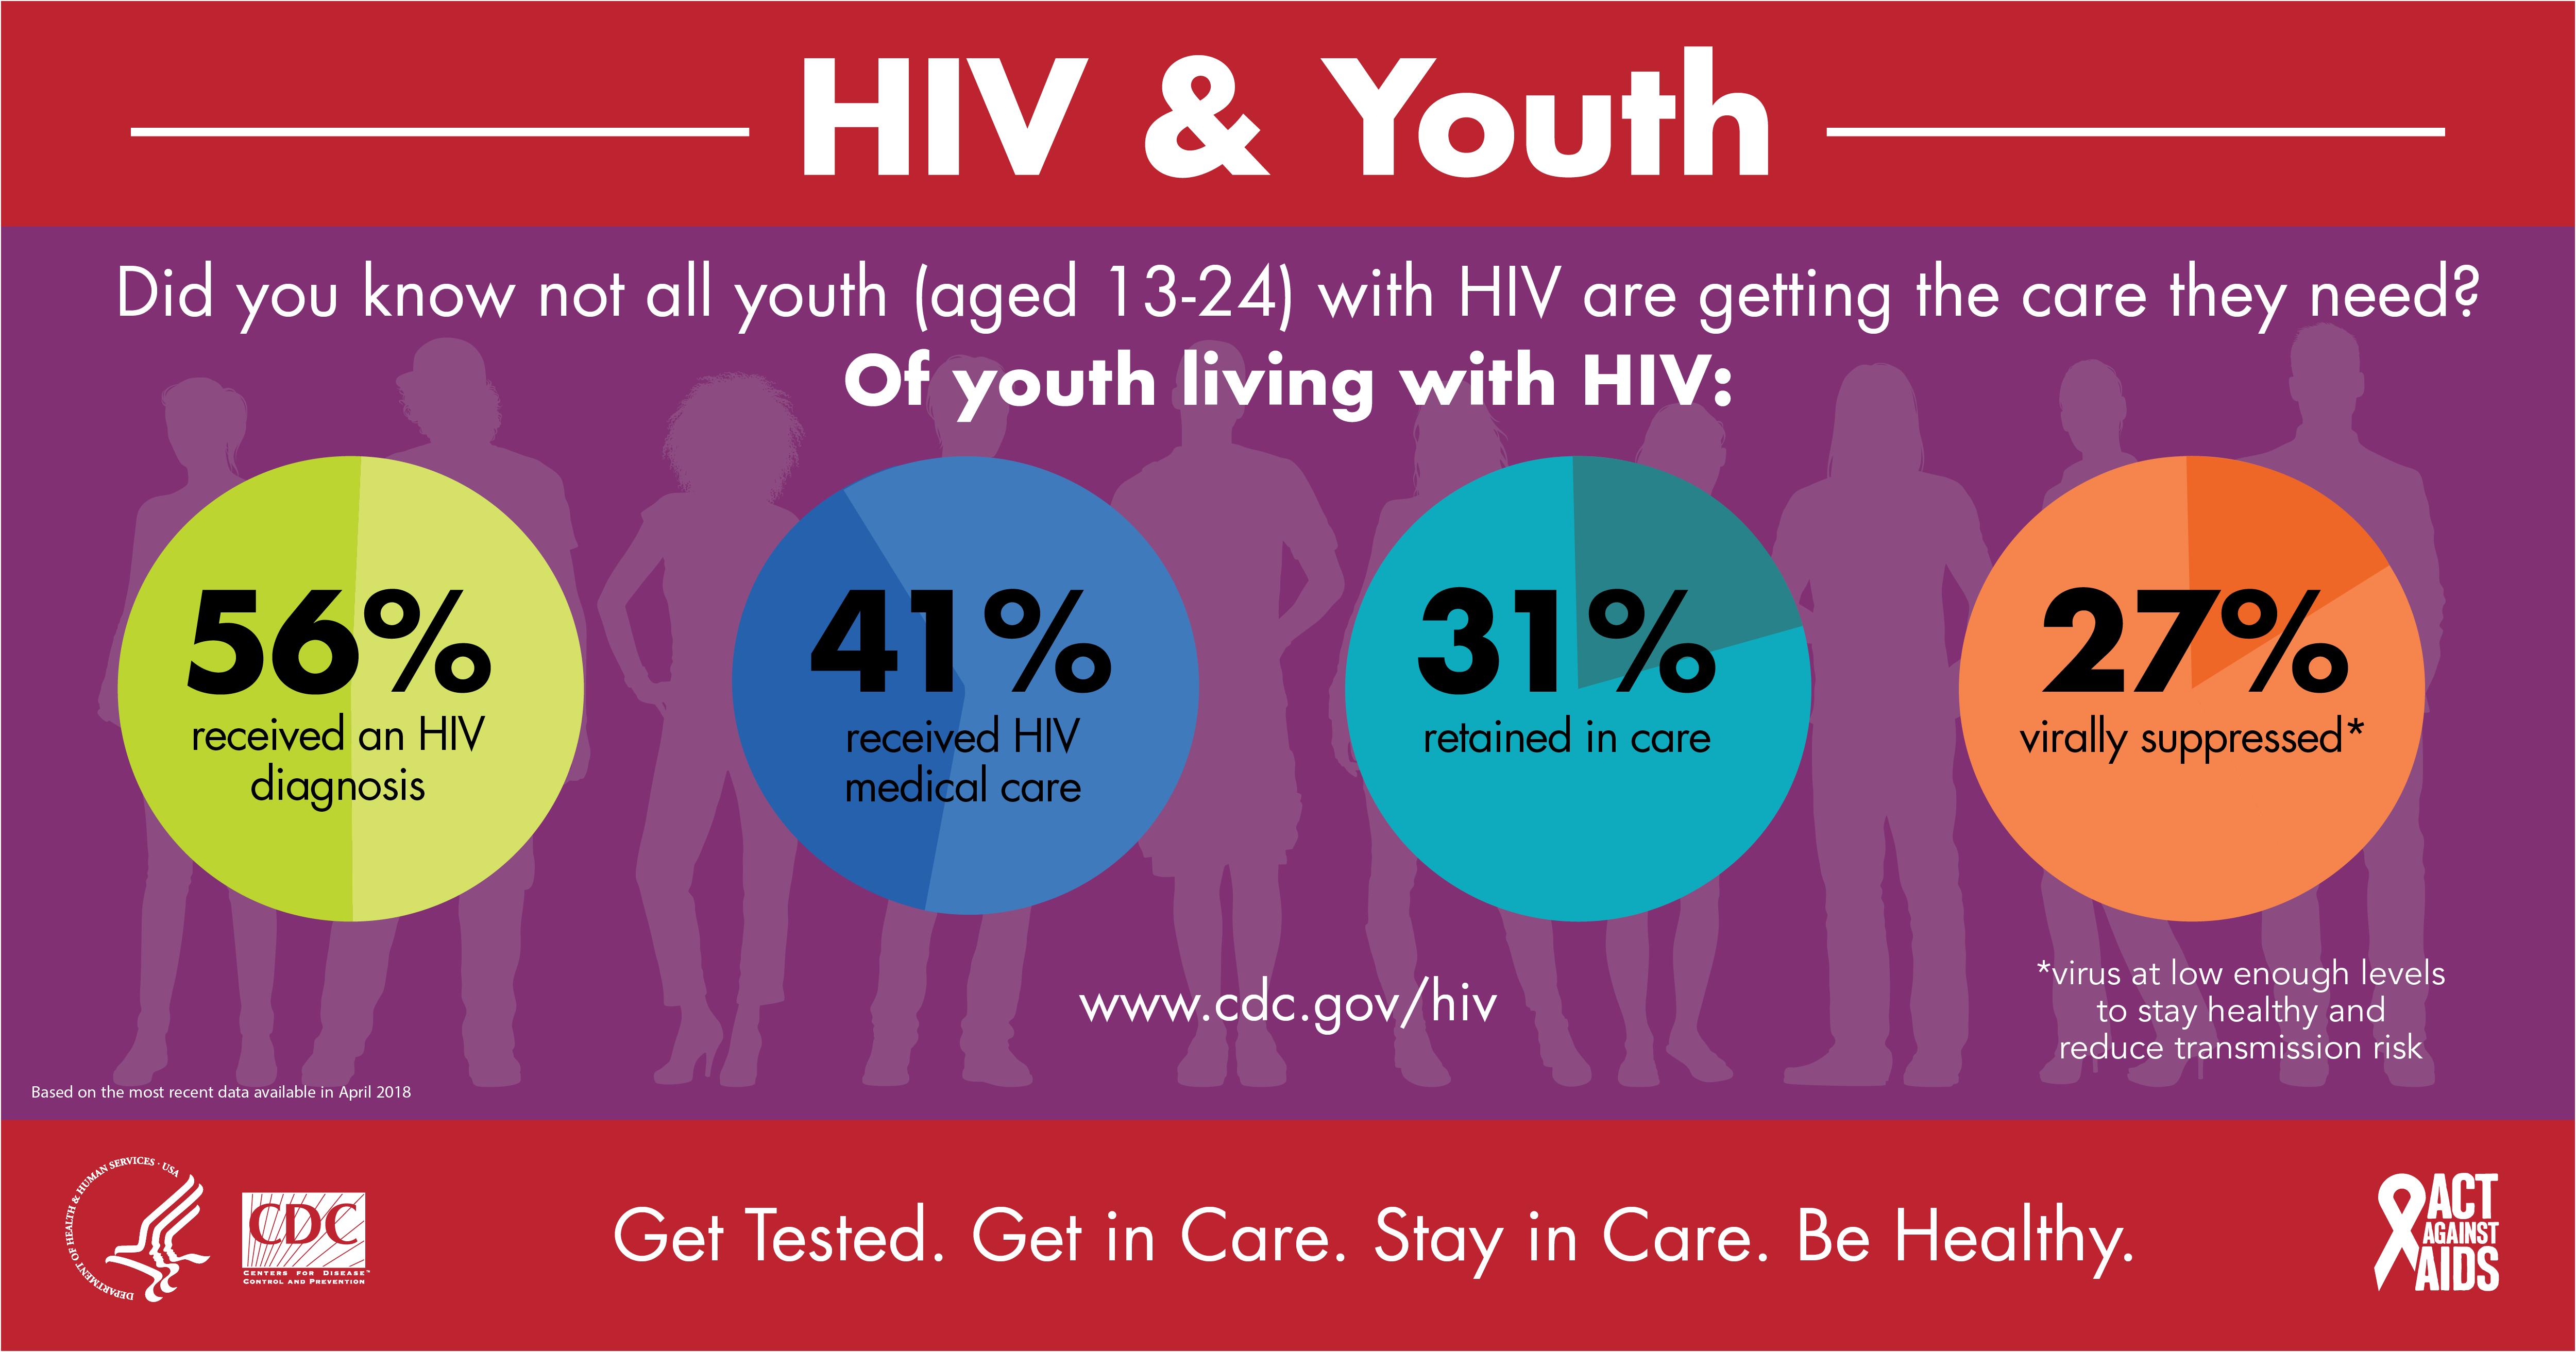 AIDS online dating vapaa Christian dating sites Ontariossa Kanadassa